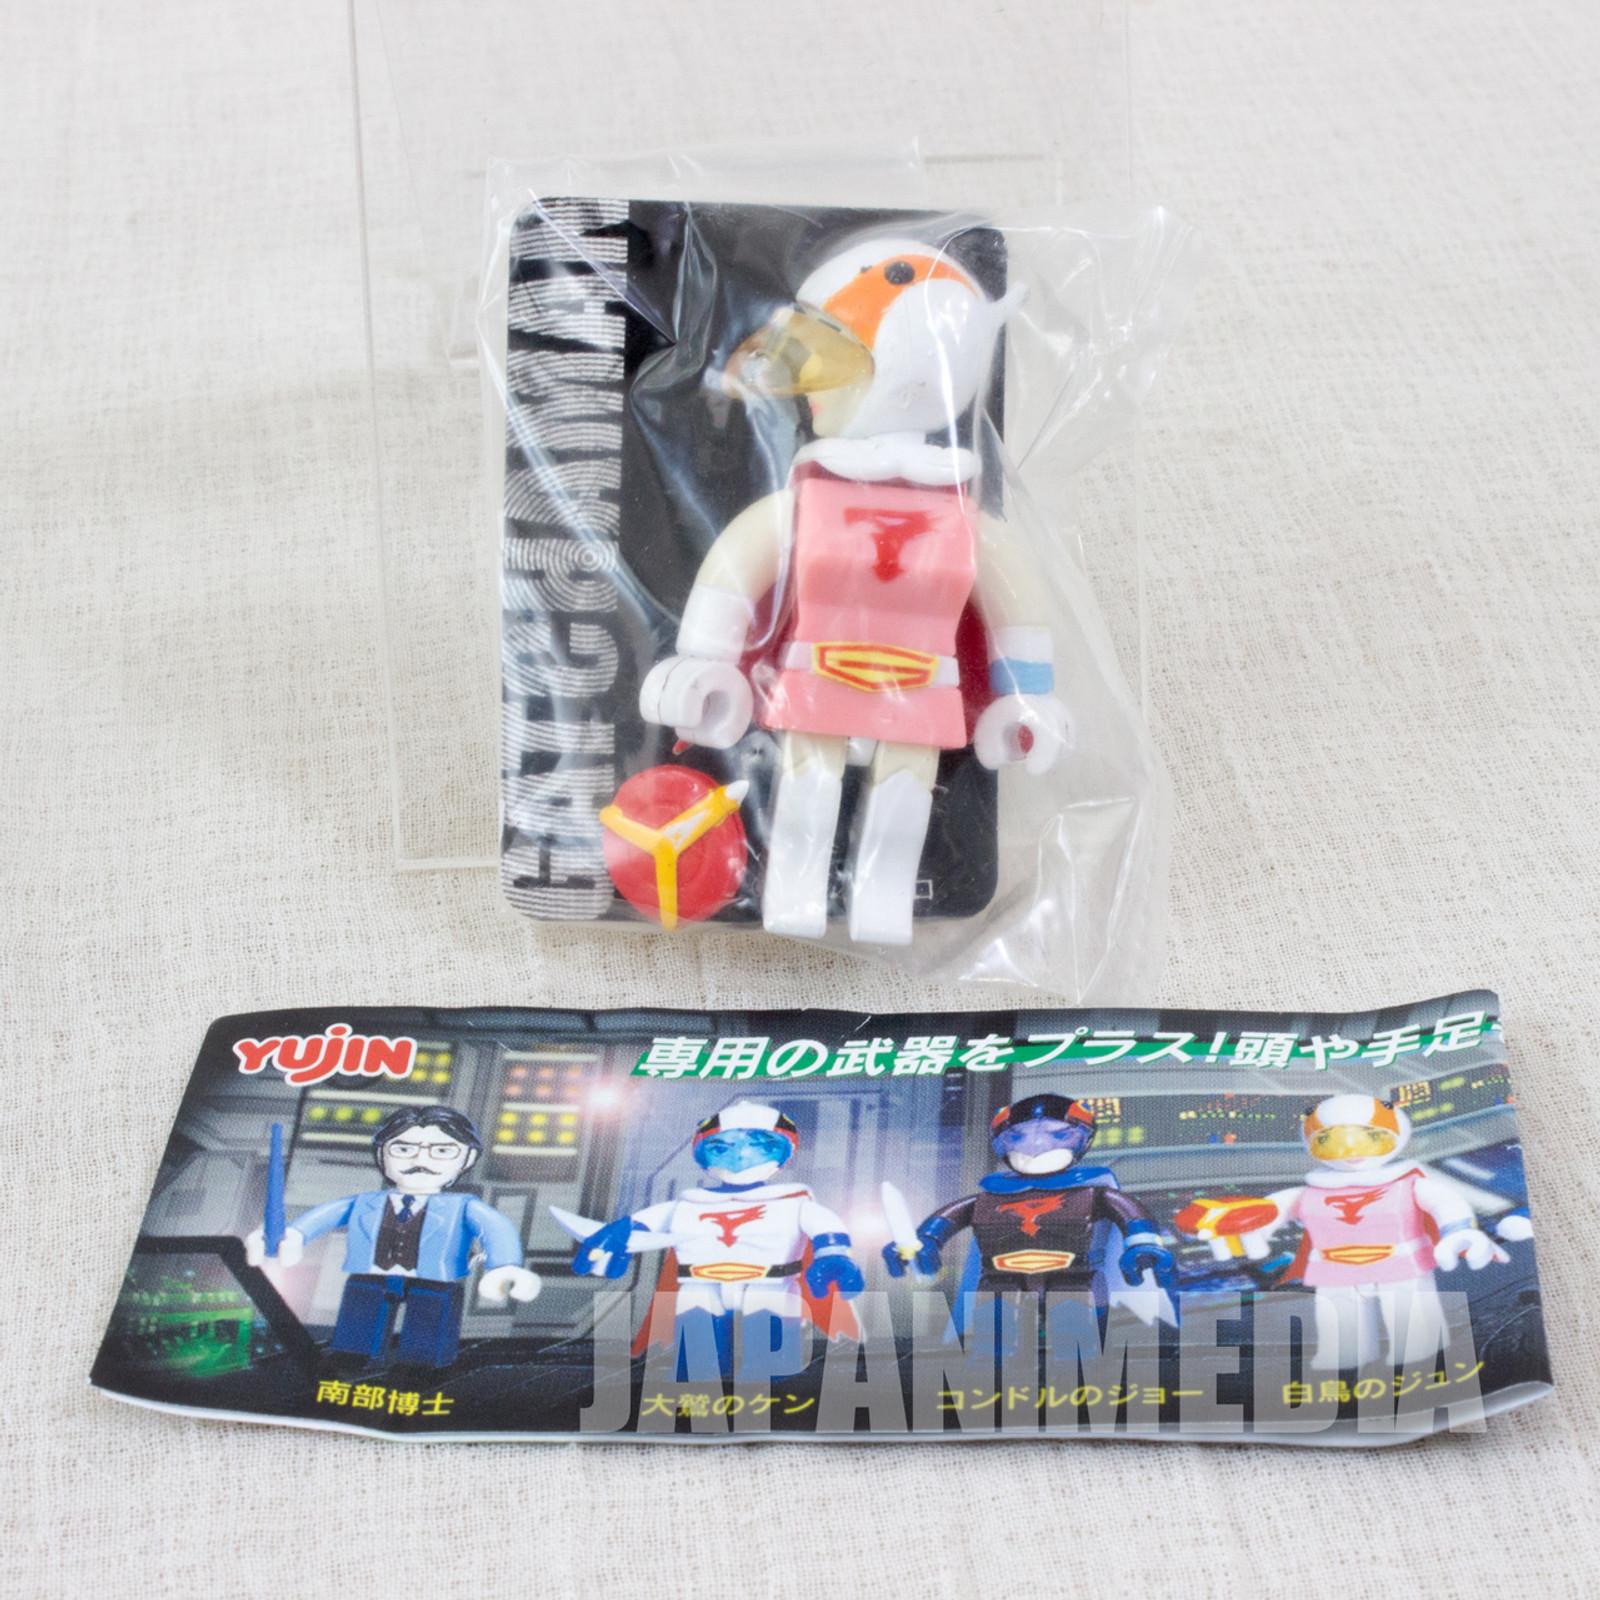 Gatchaman Jun the Swan G-3 Box Figure Collection Yujin JAPAN ANIME MANGA